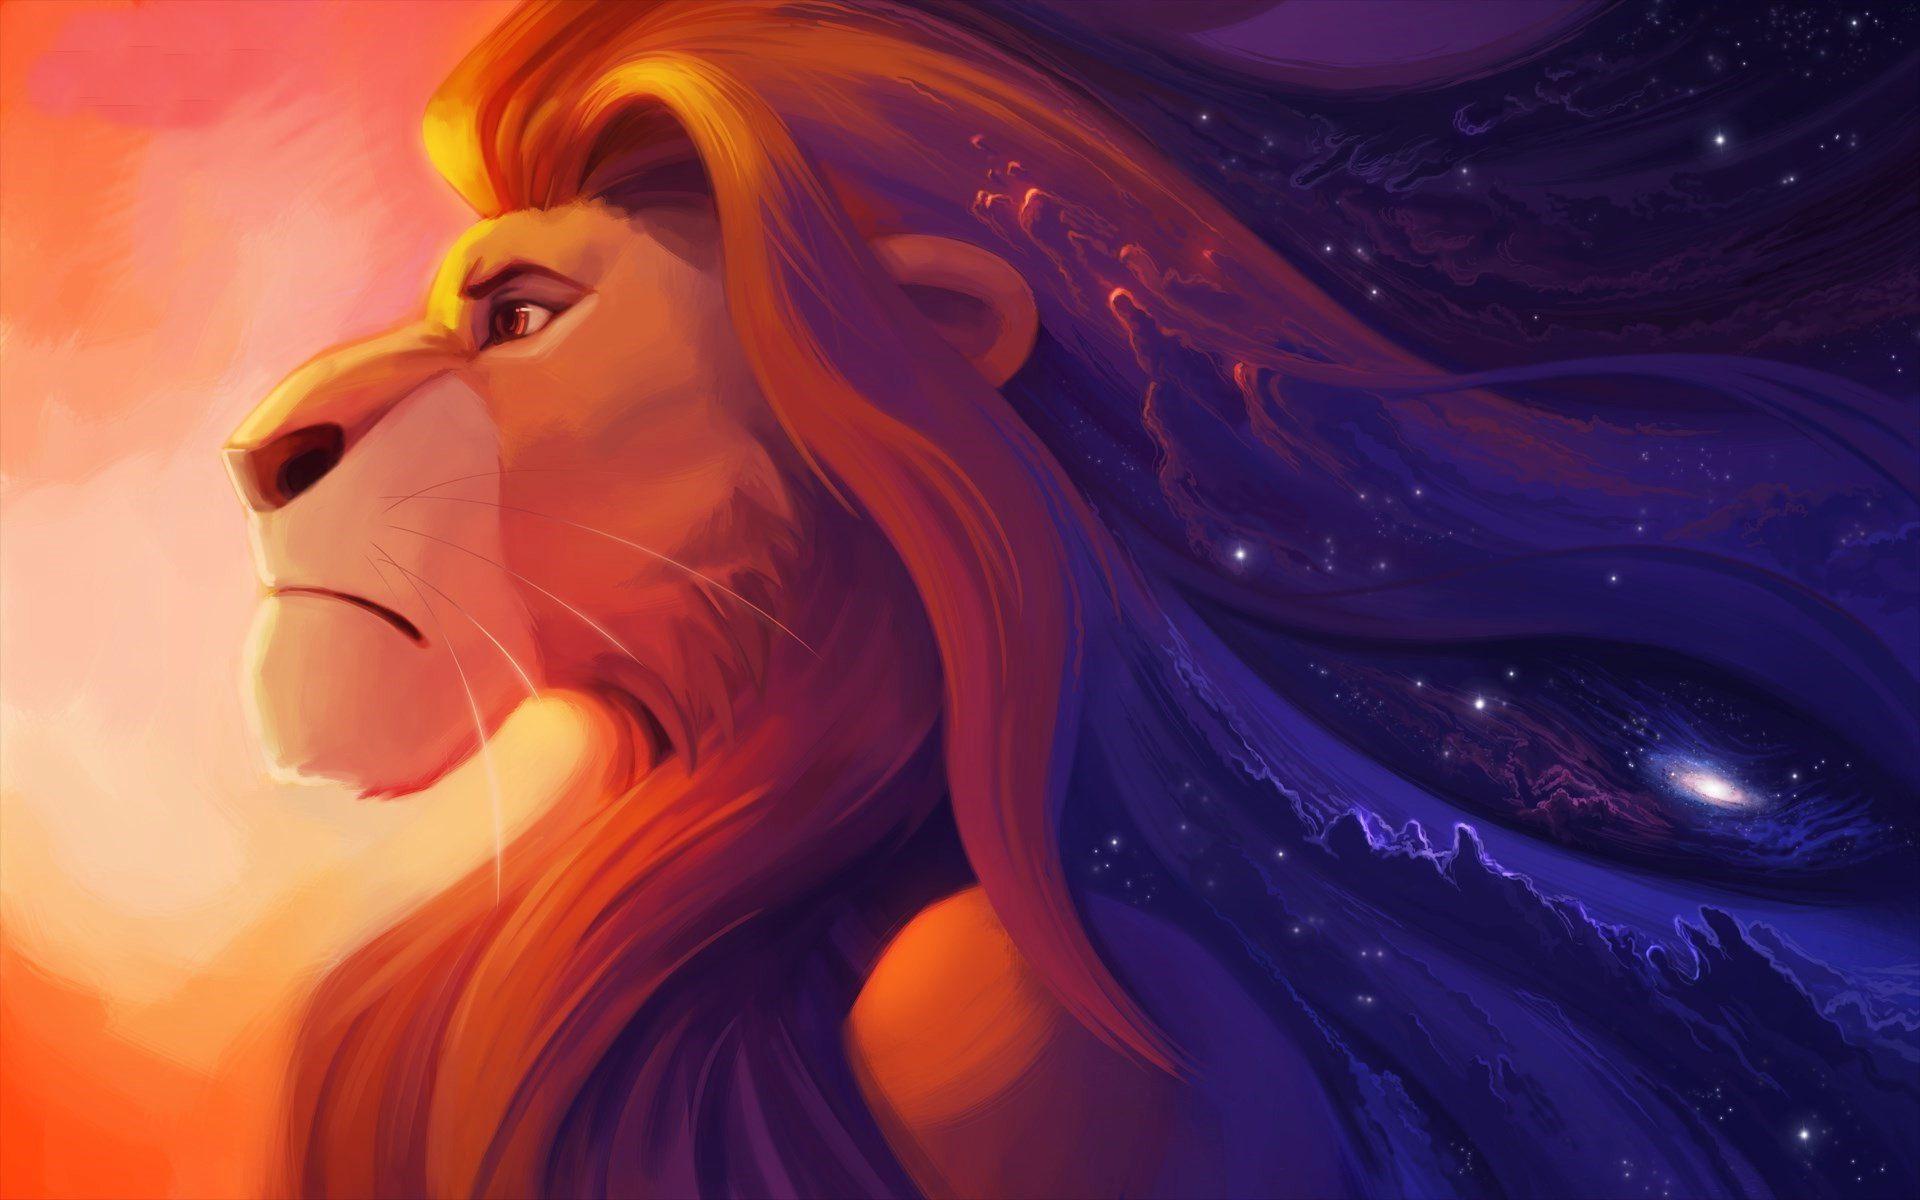 The Lion King Wallpaper - WallpaperSafari